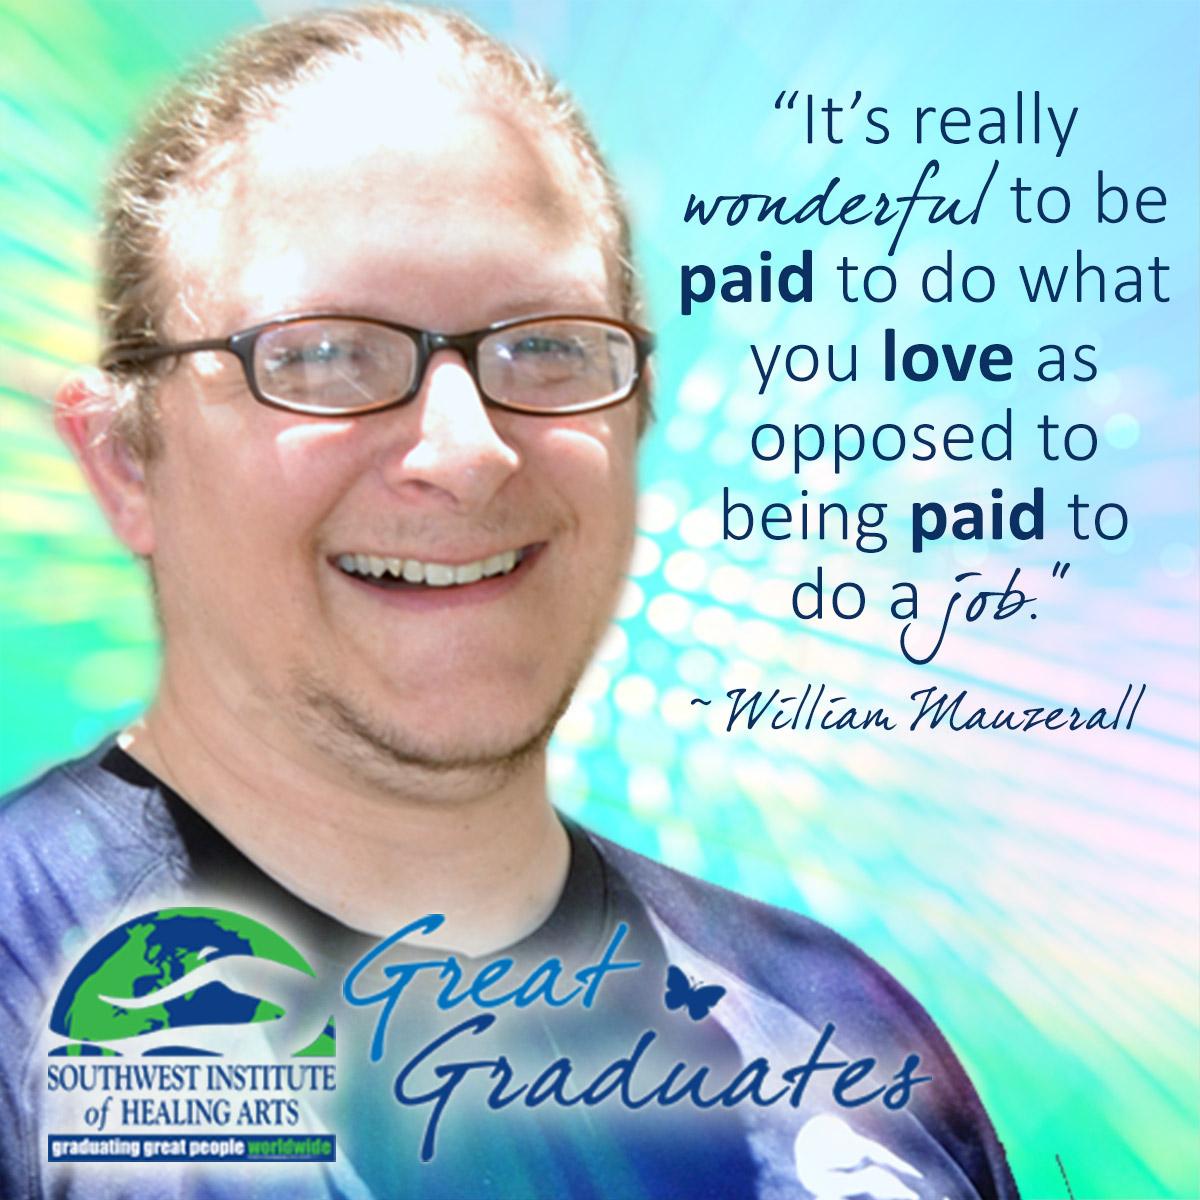 Great-Graduates-William-Mauzerall-Southwest-Institute-of-Healing-Arts-02